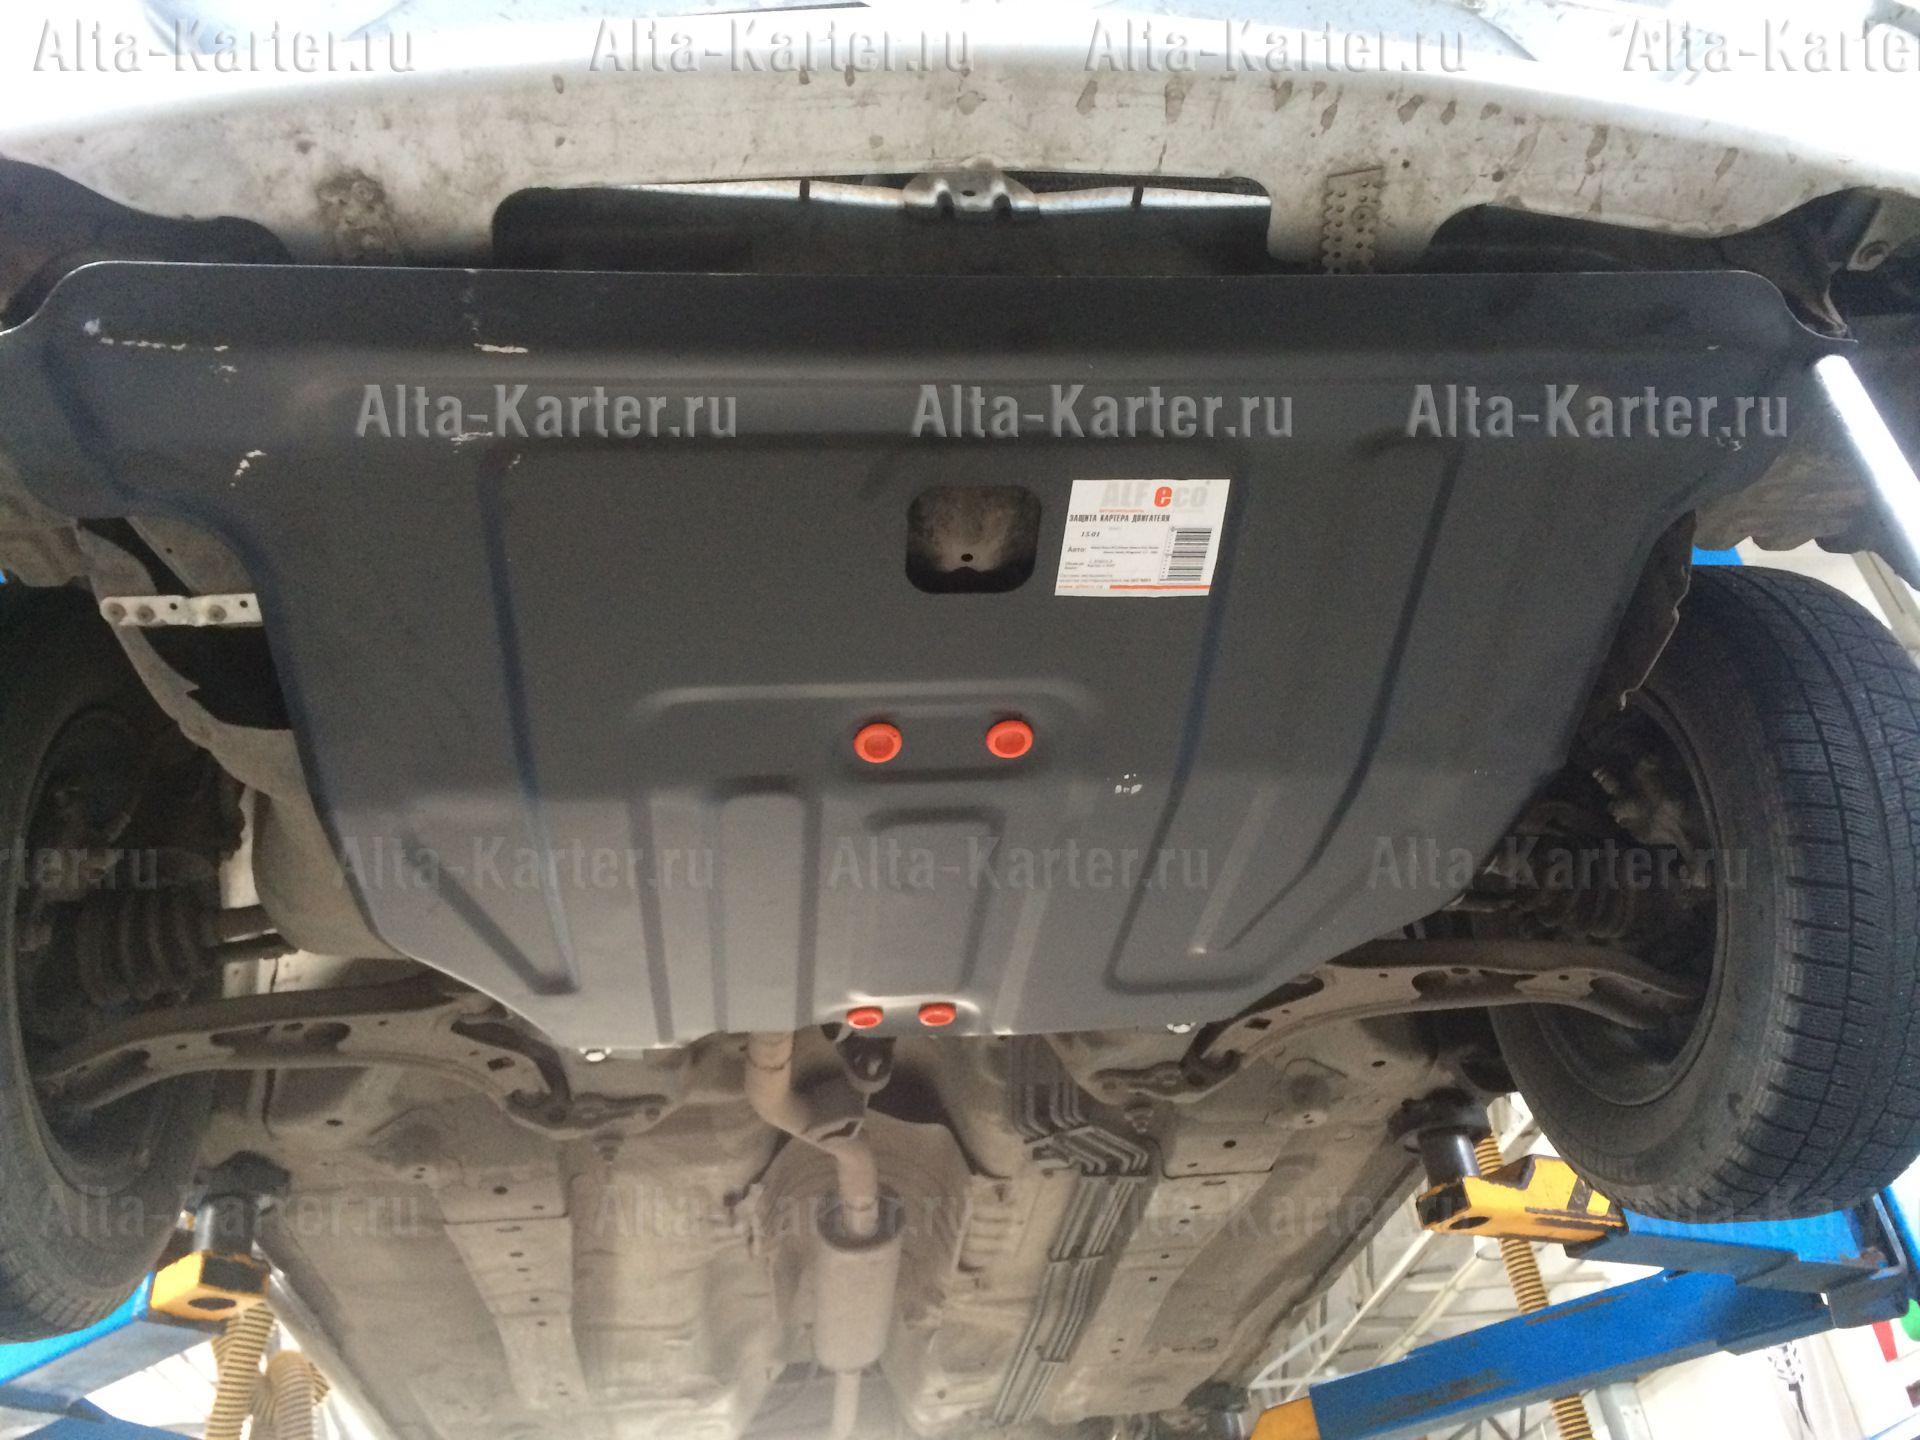 Защита 'Alfeco' для картера и КПП Nissan AD Y11 2WD 1999-2008. Артикул ALF.15.01